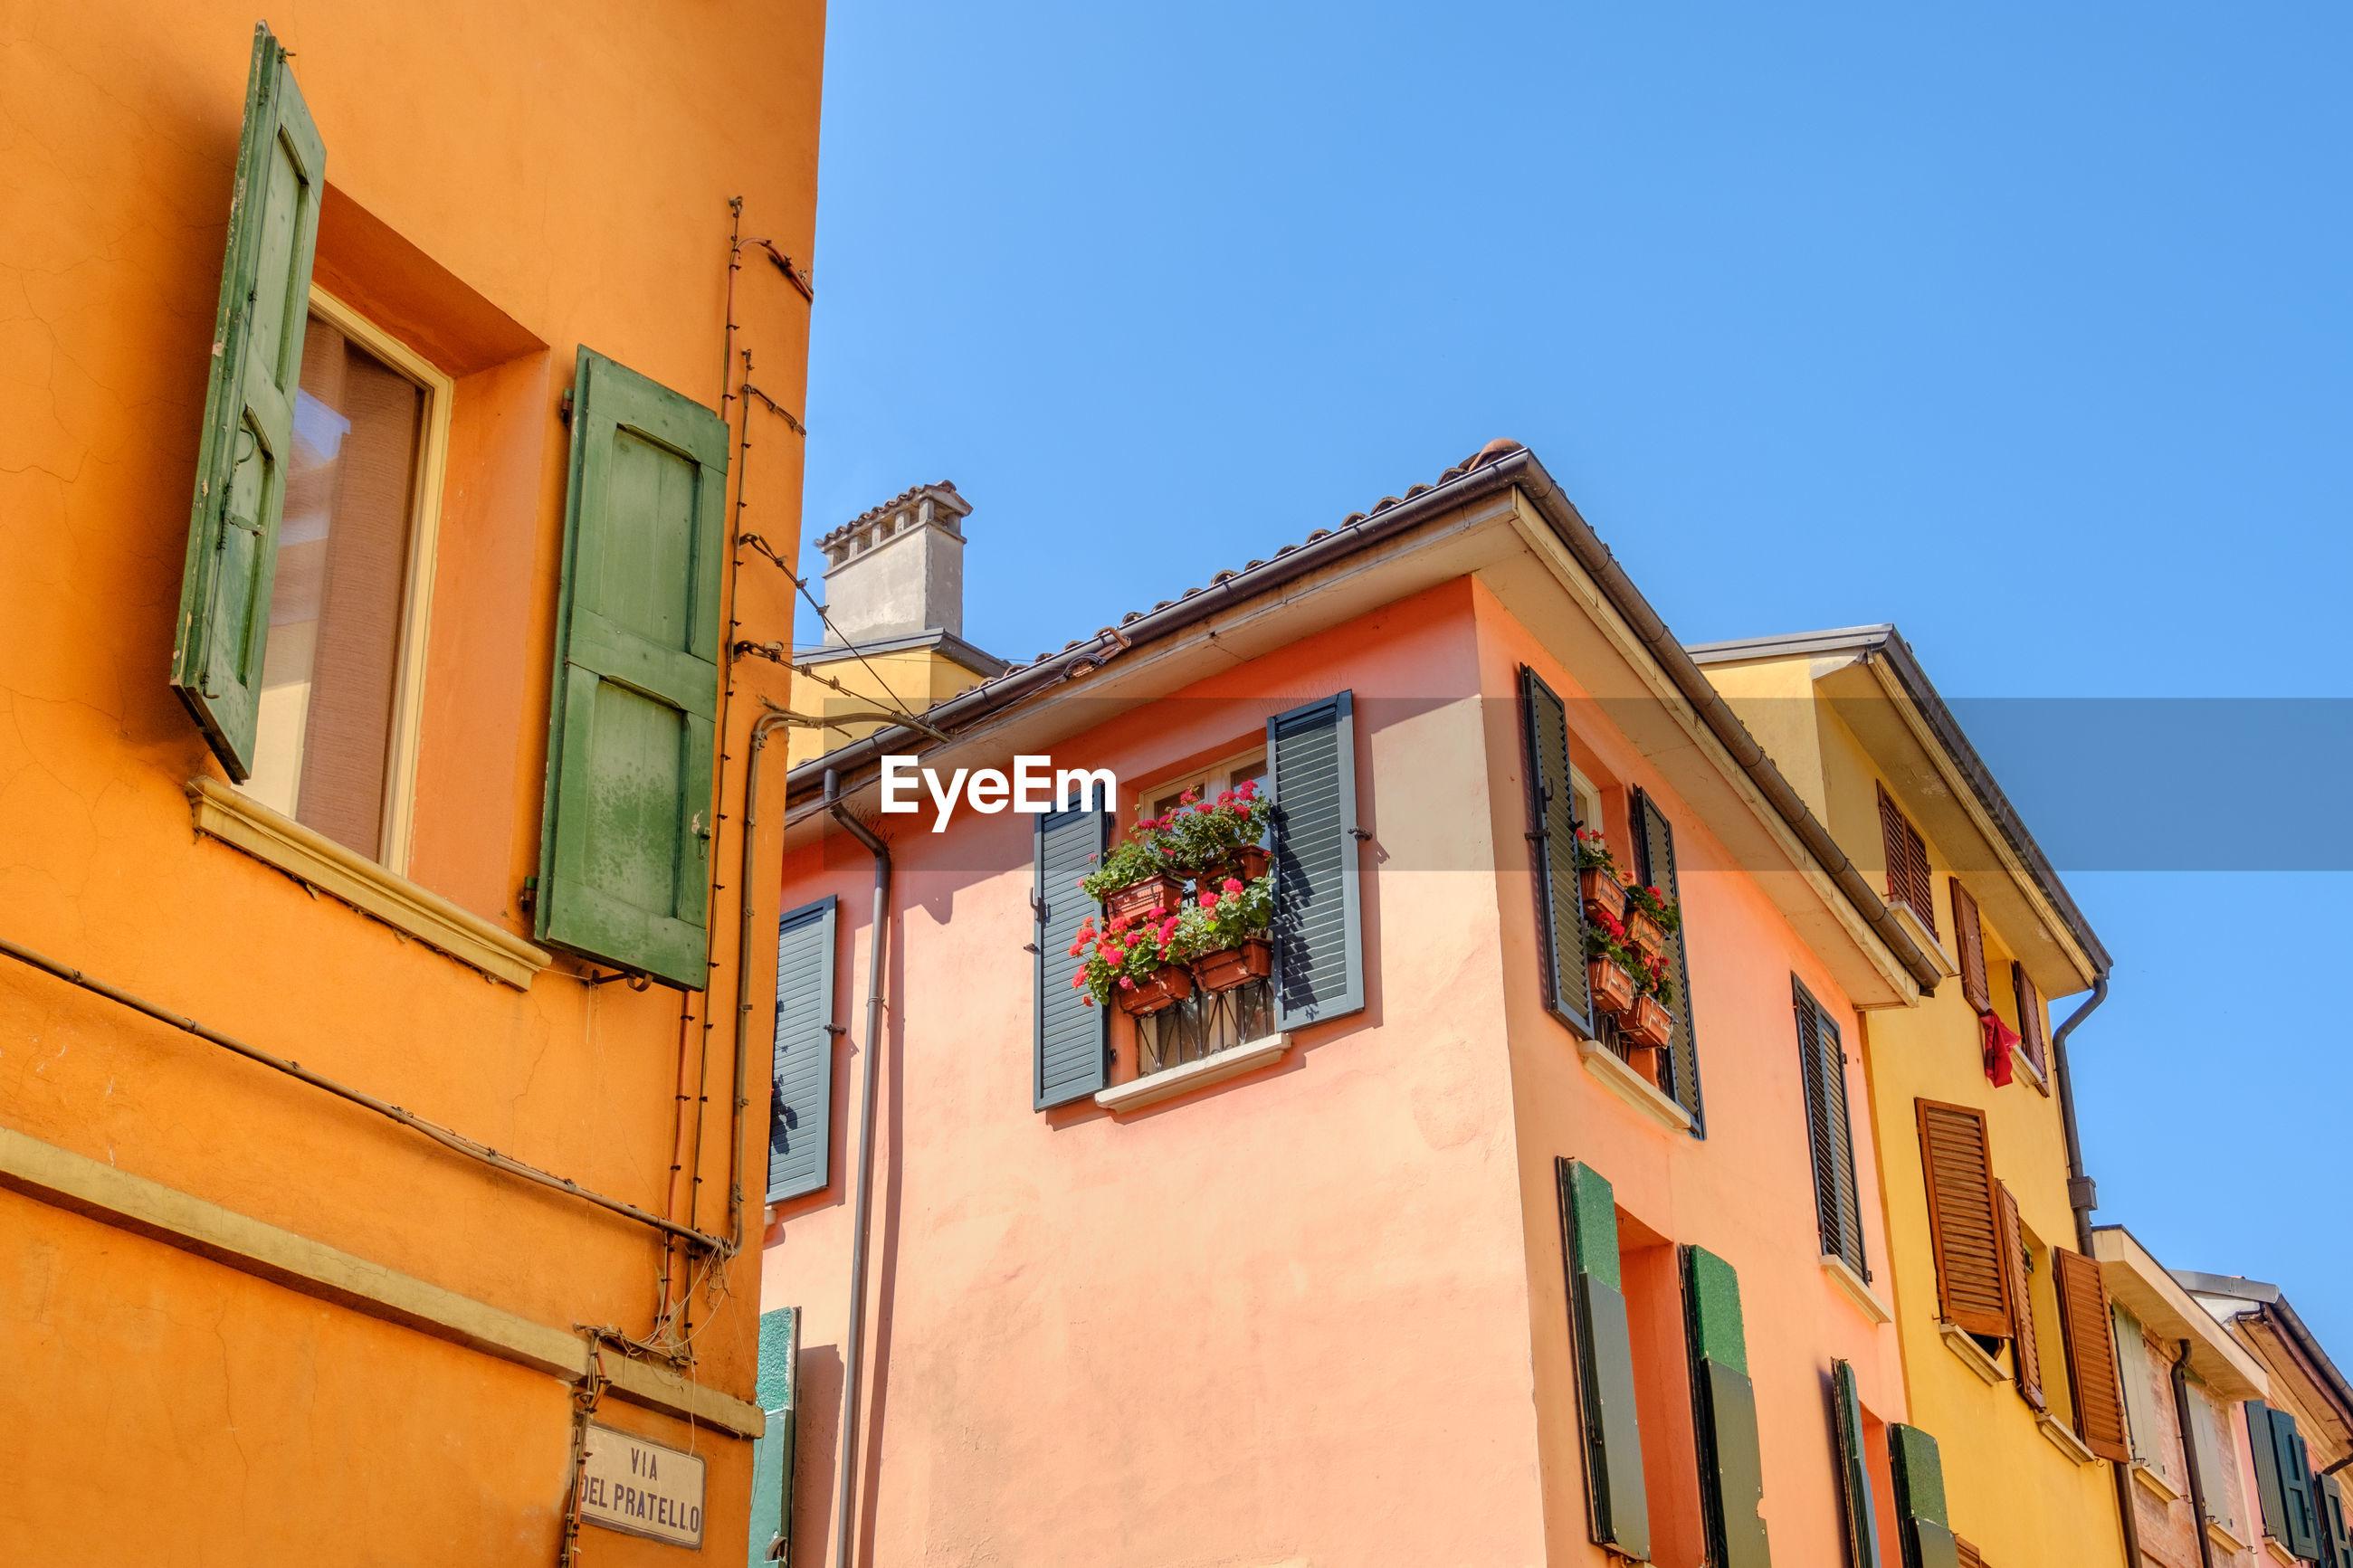 Italian houses bologna via del pratello emilia romagna italy